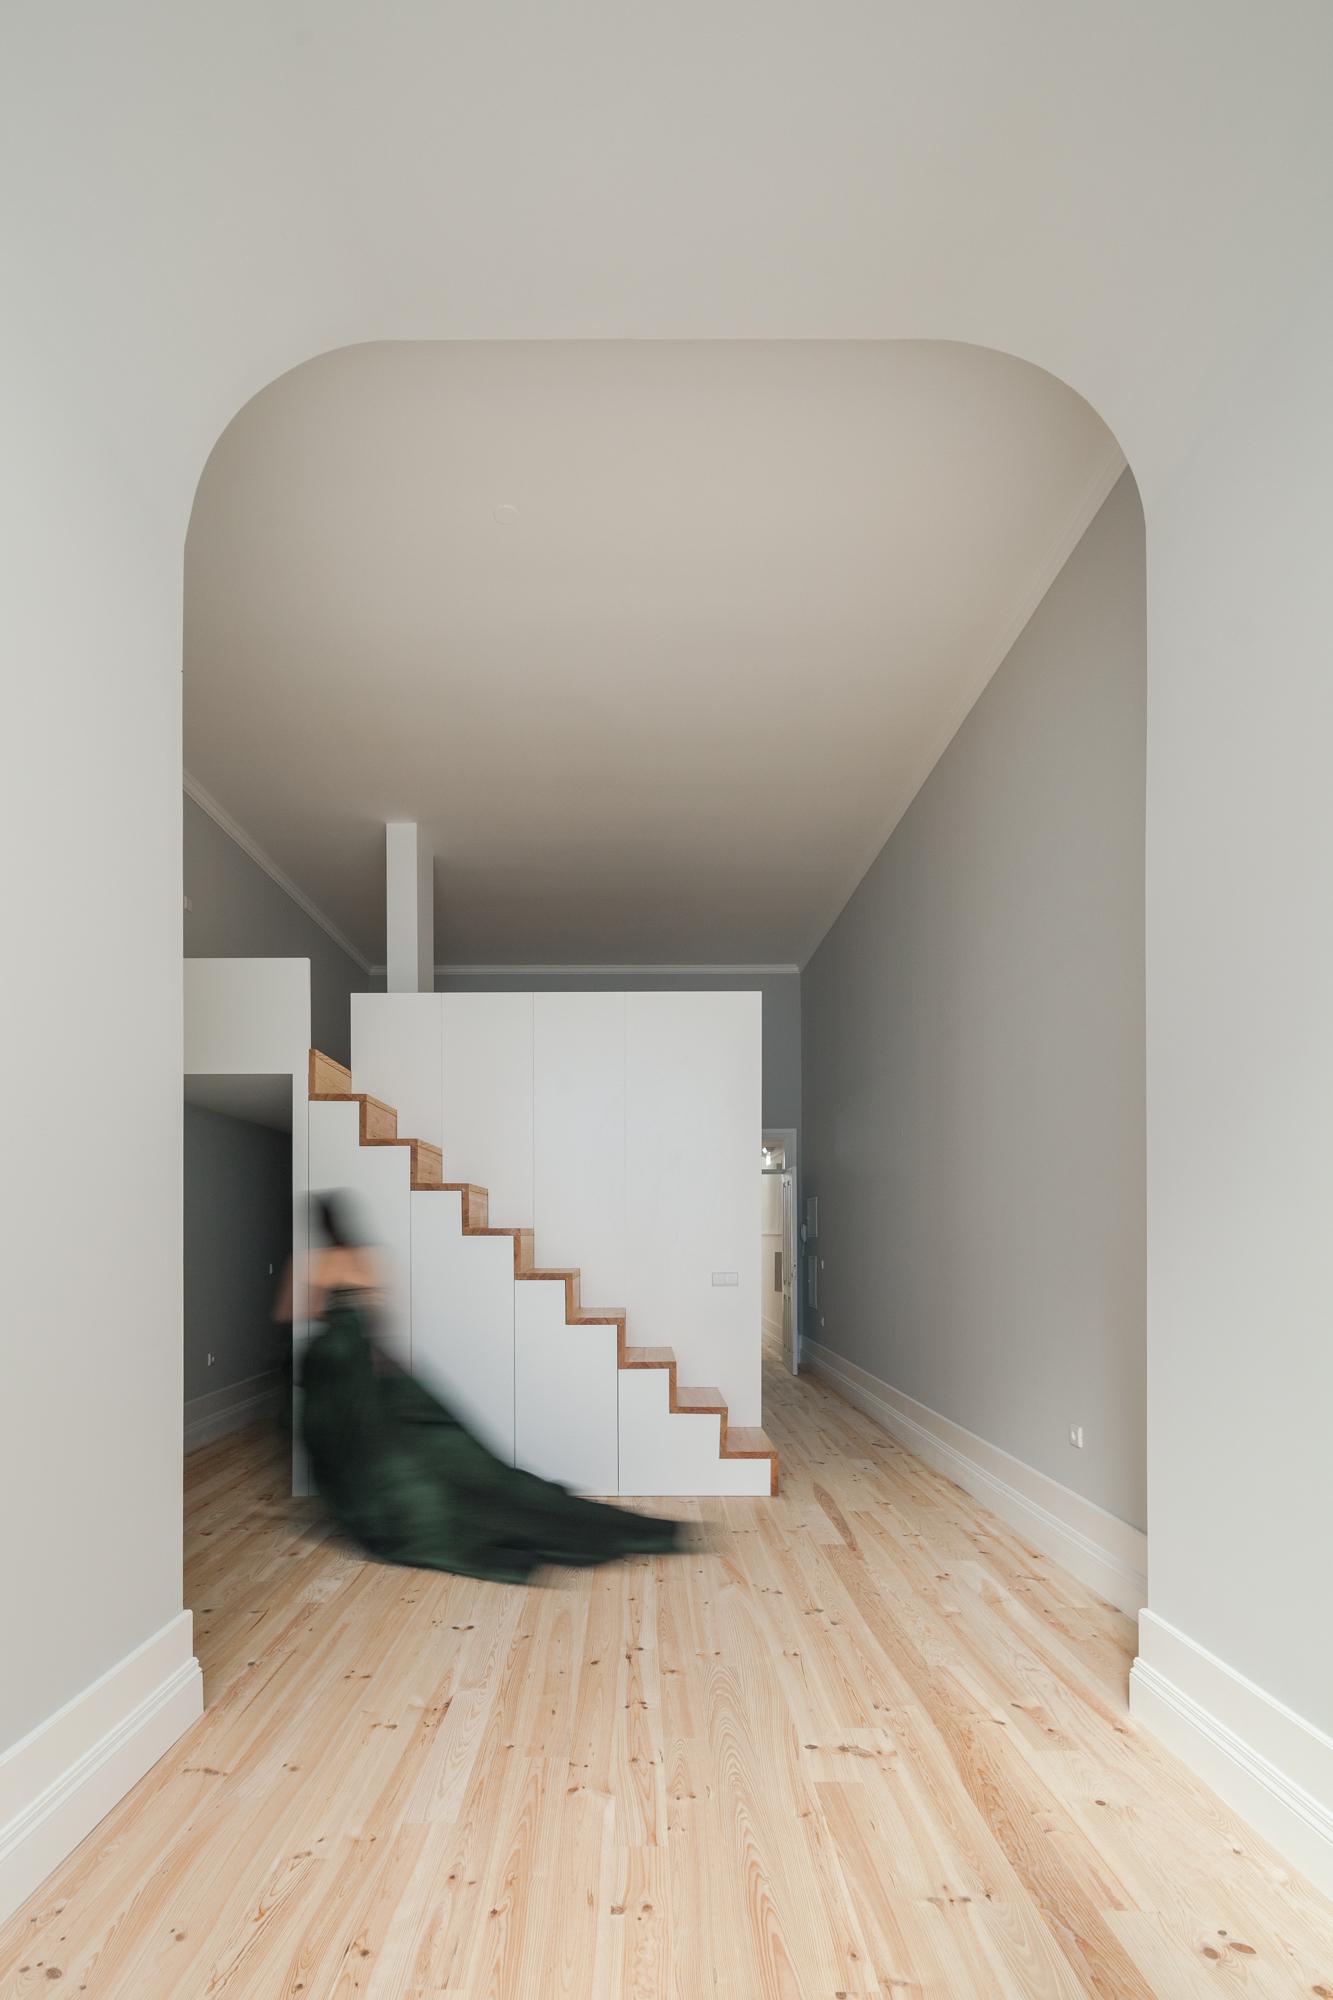 Casa Santa Teresa / PF Architecture Studio